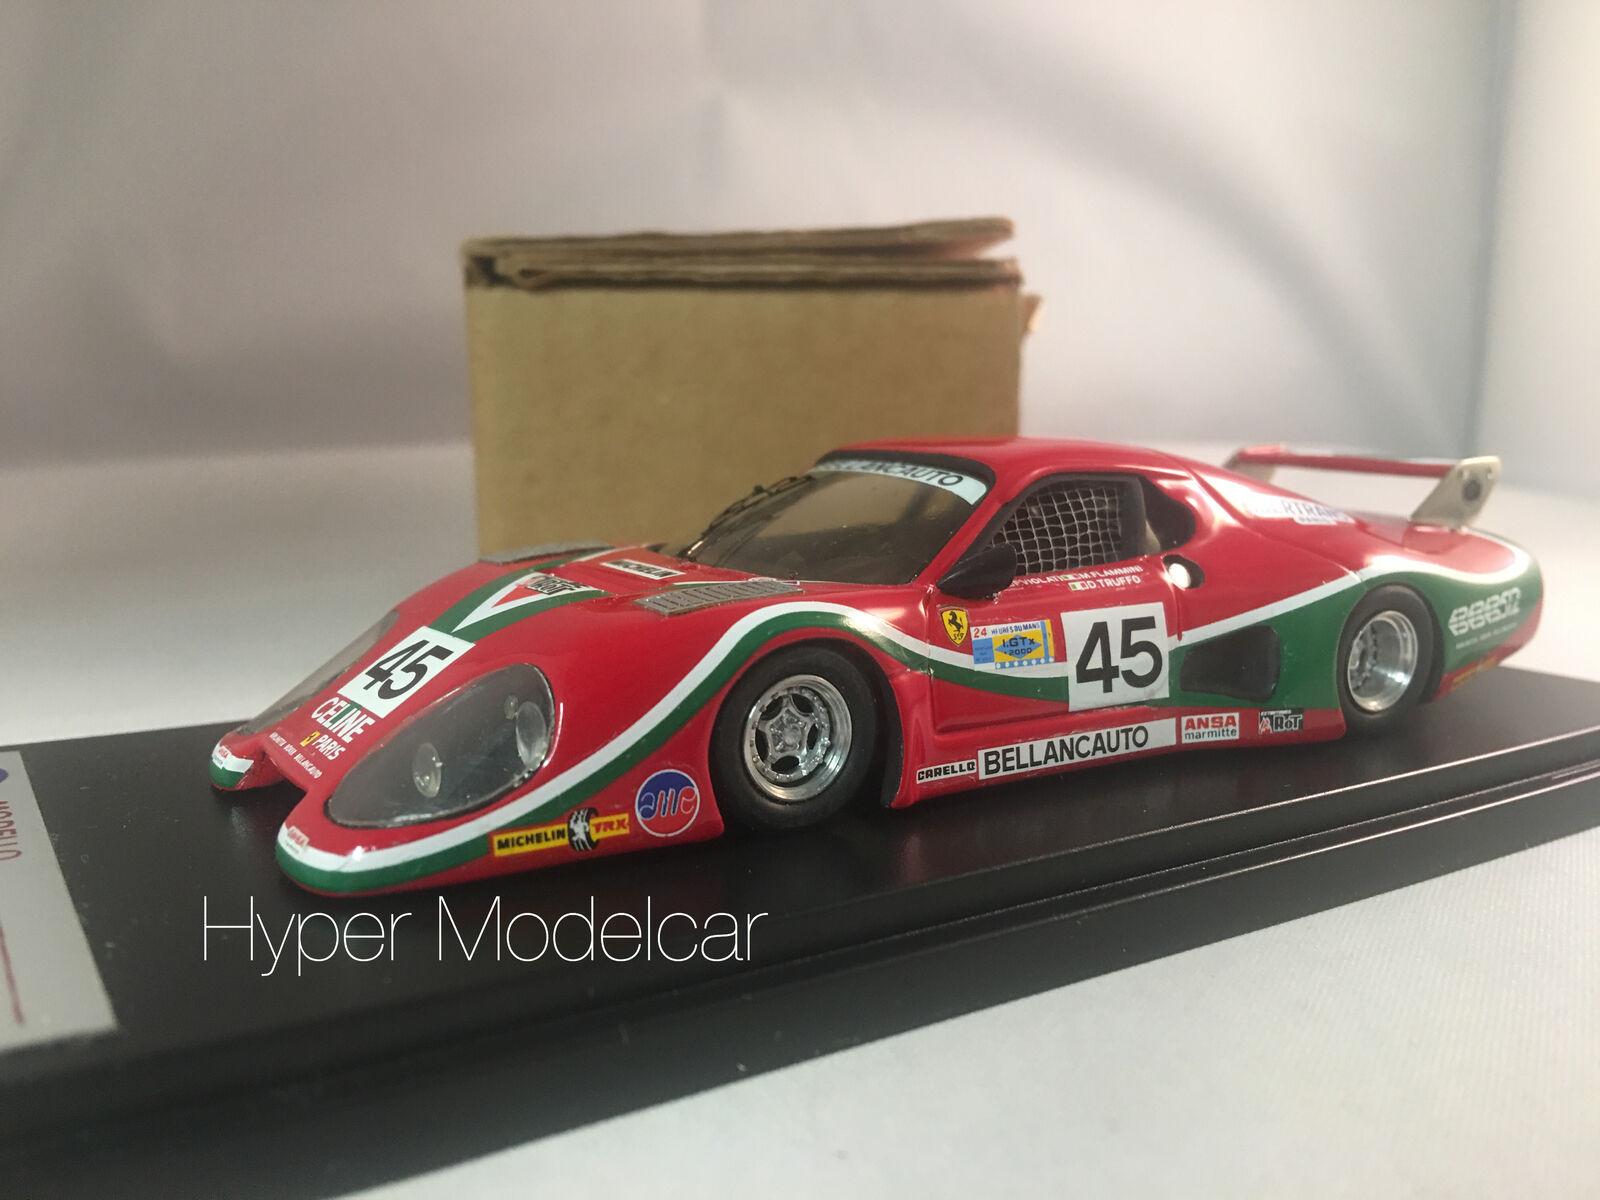 AMR 1 43 Ferrari 512 BB  45 Bellancauto Le Mans 1981